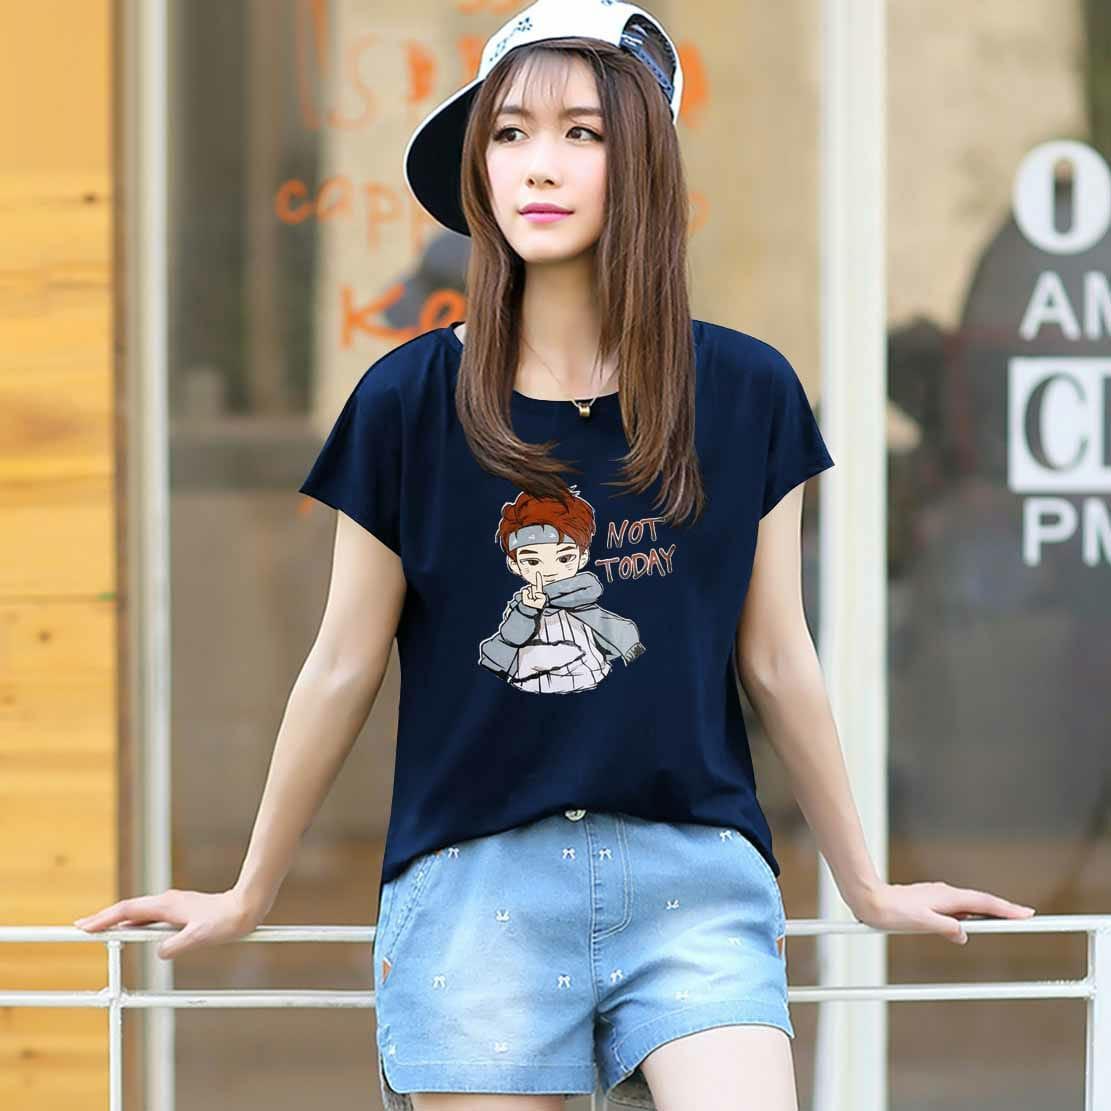 Pakaian Vanessa Daftar Harga Desember 2018 Lagenza Celana Pendek Pria High Quality Modern Fit Model Casual Lzz114 Tumblr Tee T Shirt Bts Not Today Wanita